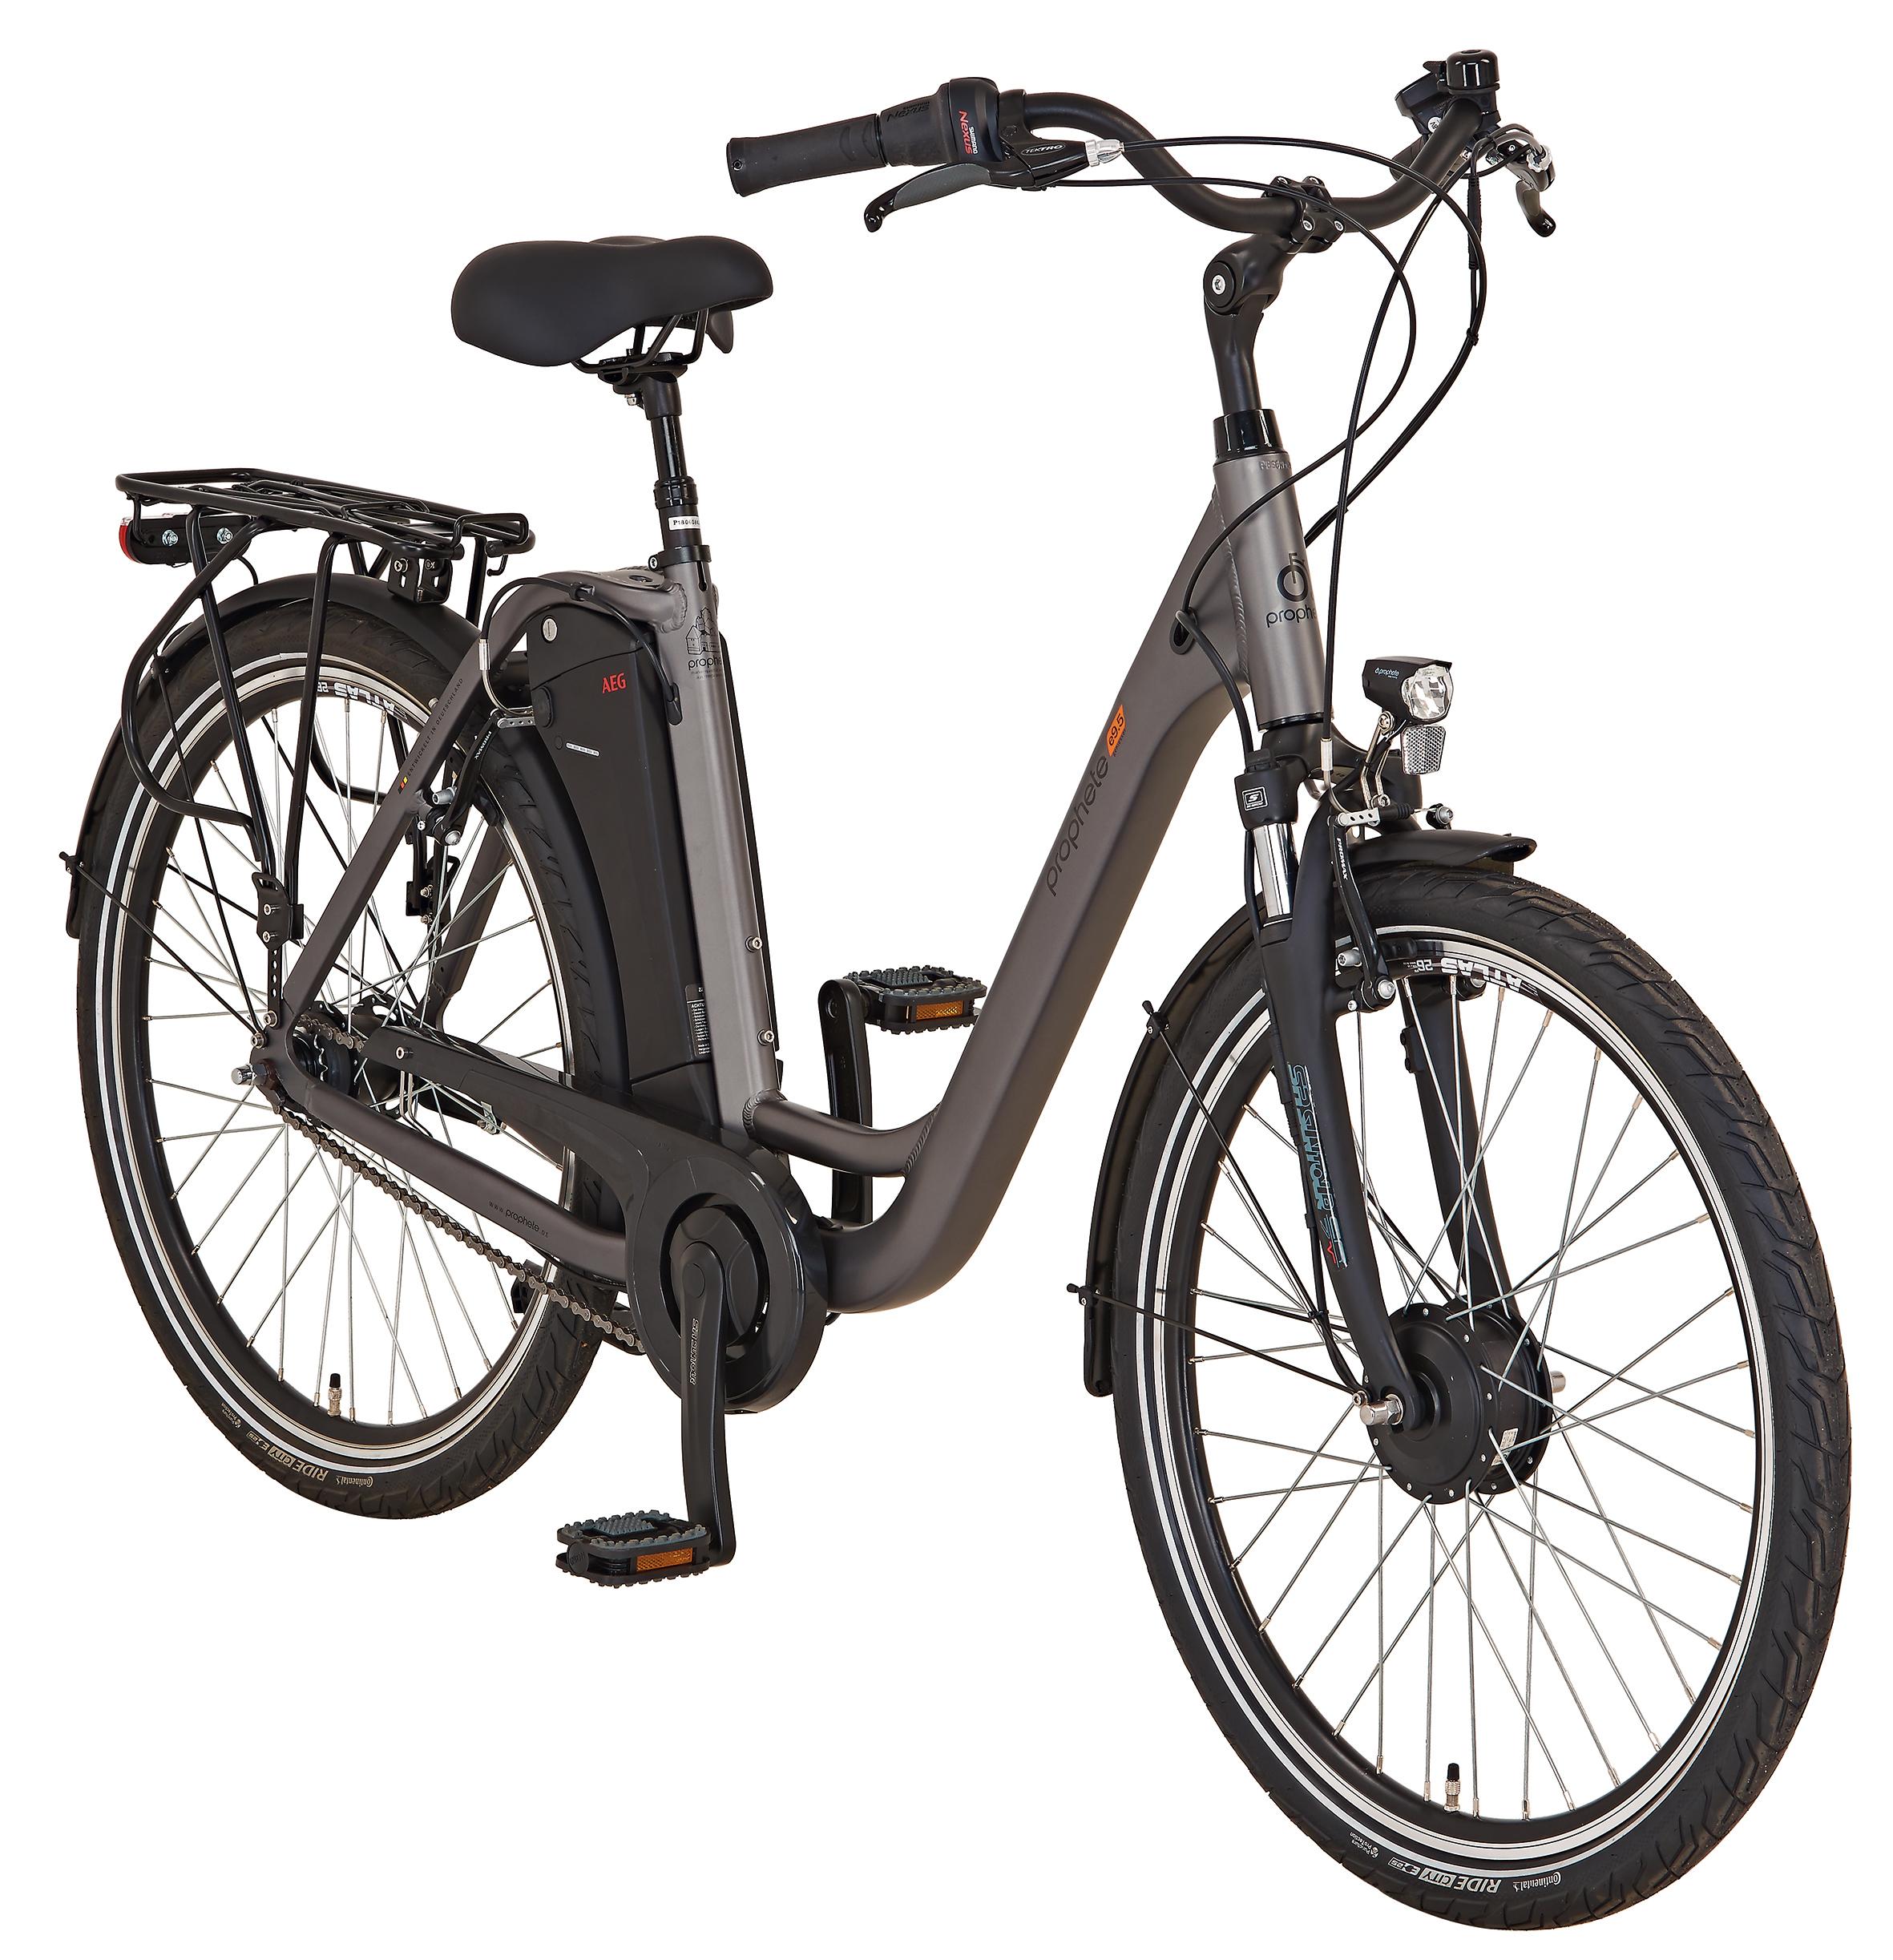 "Prophete Elektrofahrrad / E-Bike Geniesser e9.5 City E-Bike 26"" grau Bild 6"